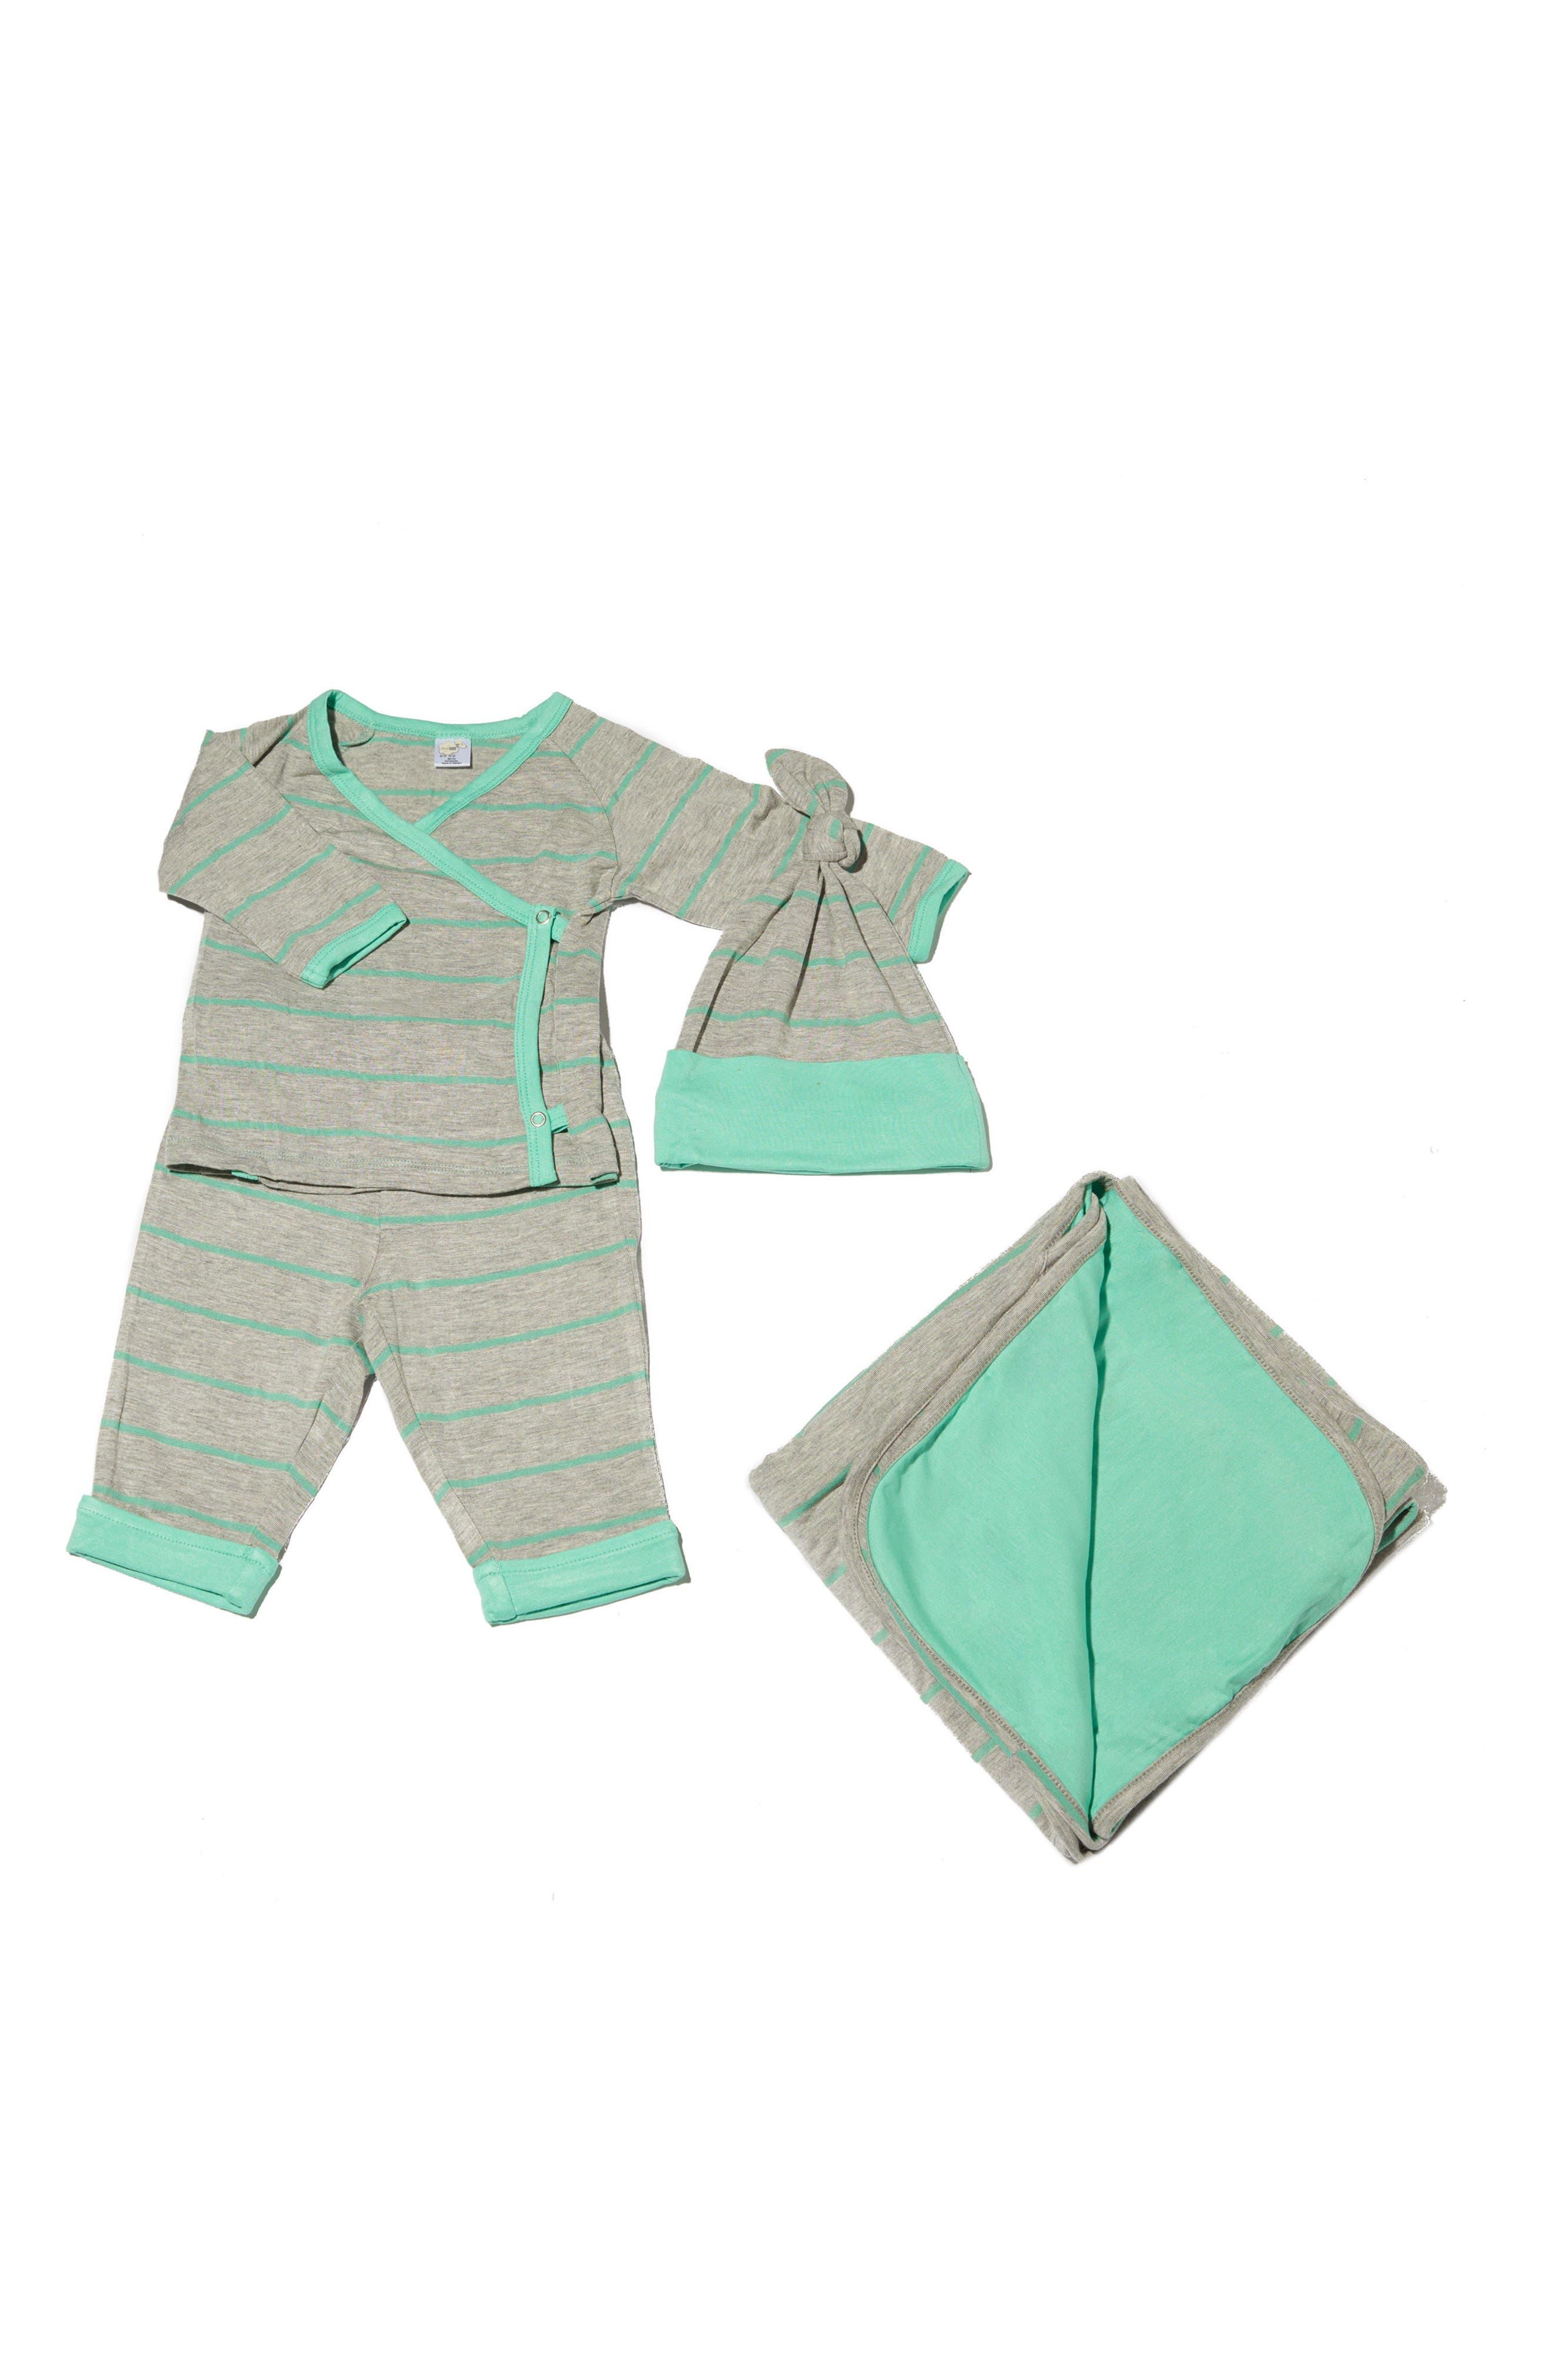 Main Image - Baby Grey T-Shirt, Pants, Hat & Blanket Set (Baby)